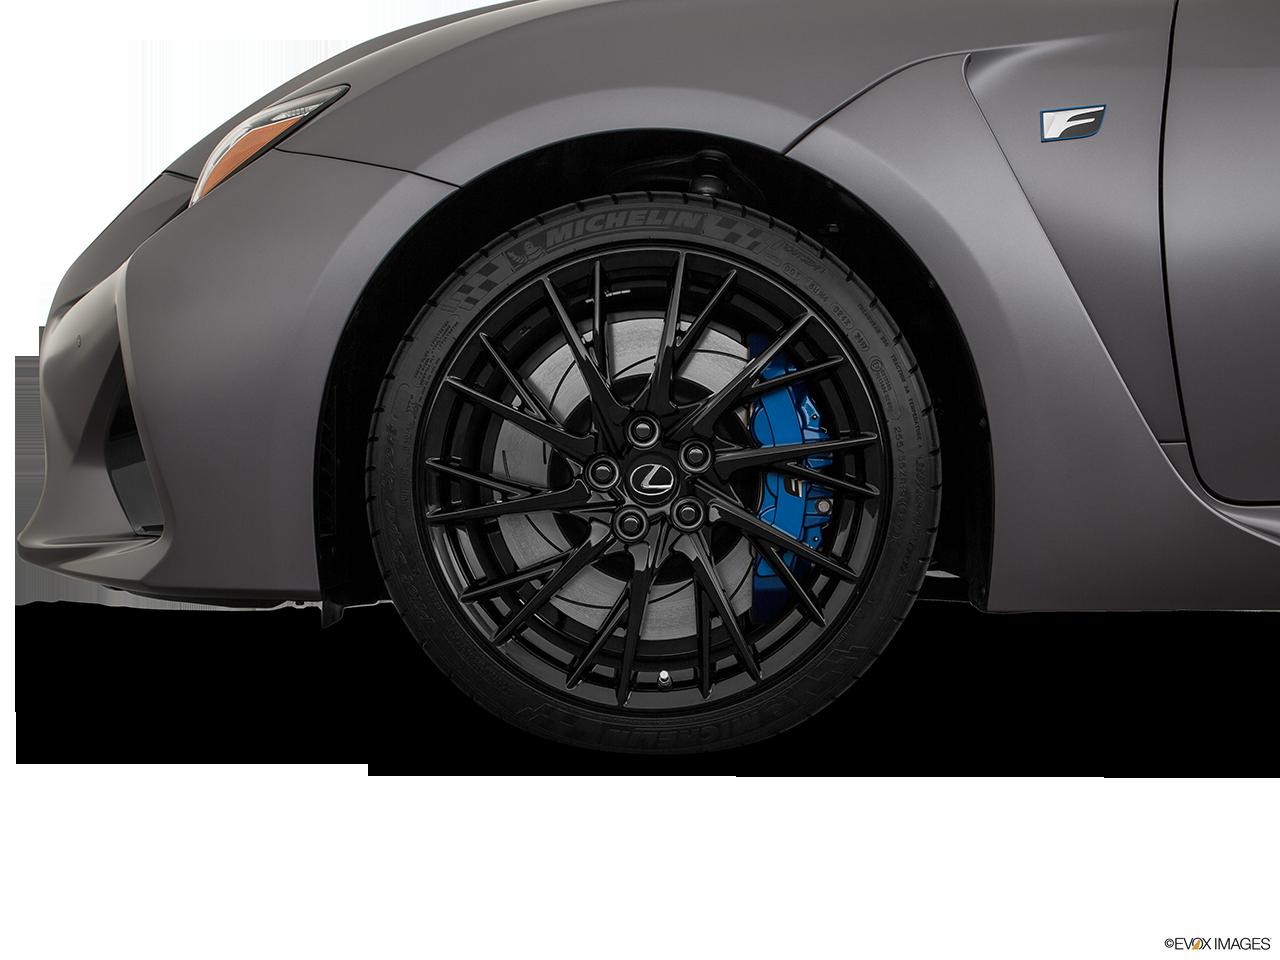 2020 Lexus RC F photo